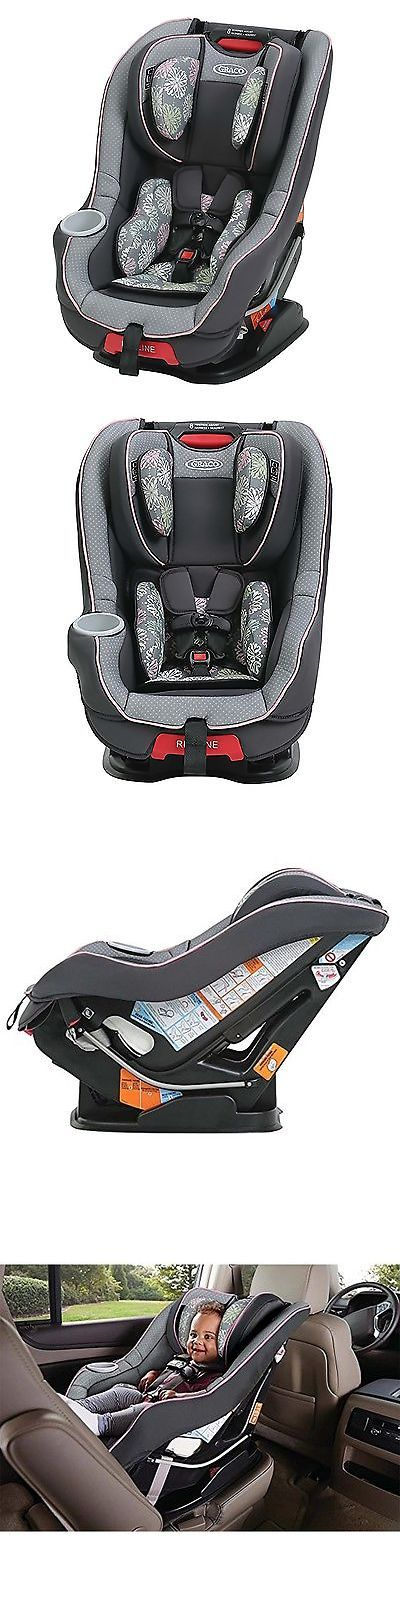 Graco MySize 65 Rear Forward Facing Convertible Infant Baby Car Seat Addison